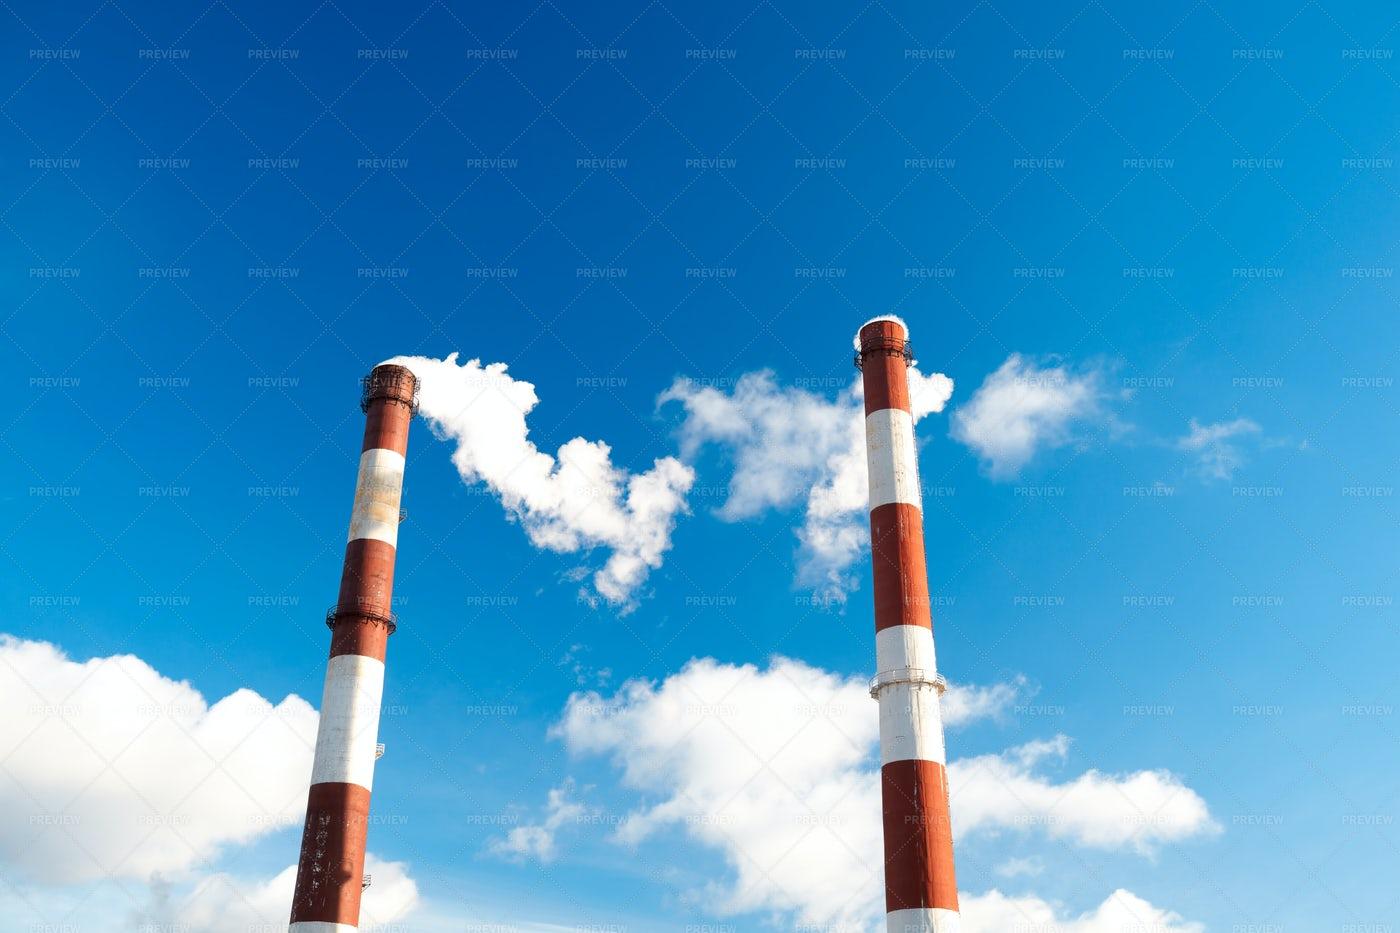 Factory Chimneys.: Stock Photos